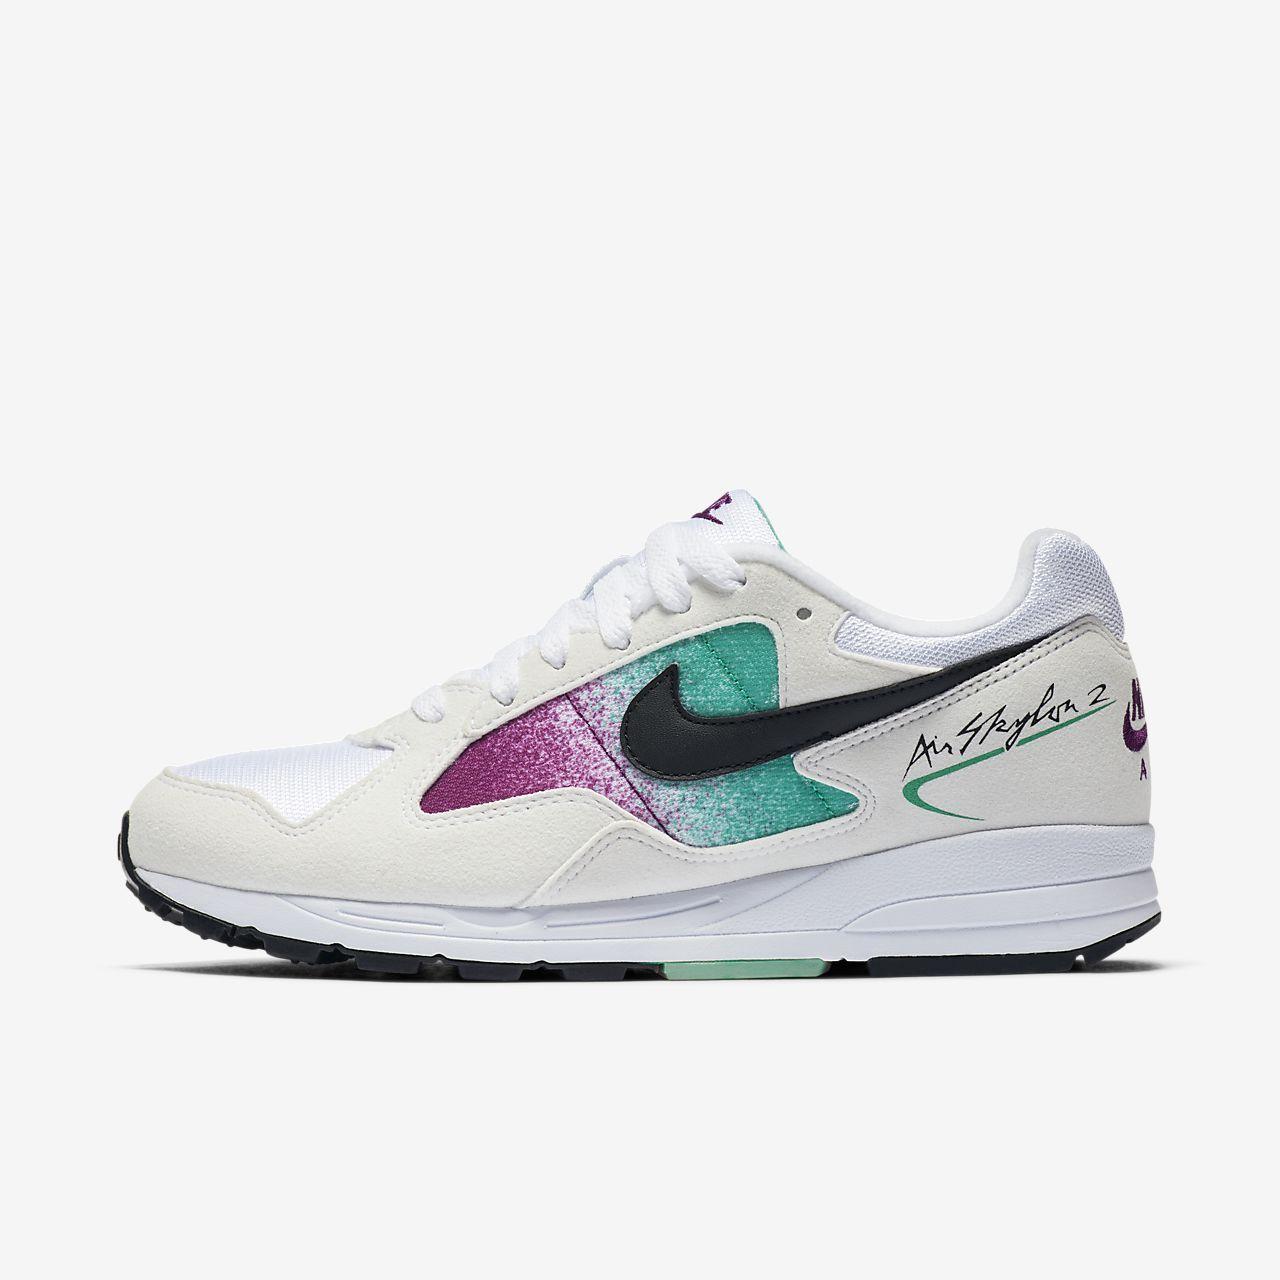 Zapatillas bajas Other Nike AIR MAX 90 LX W Violeta